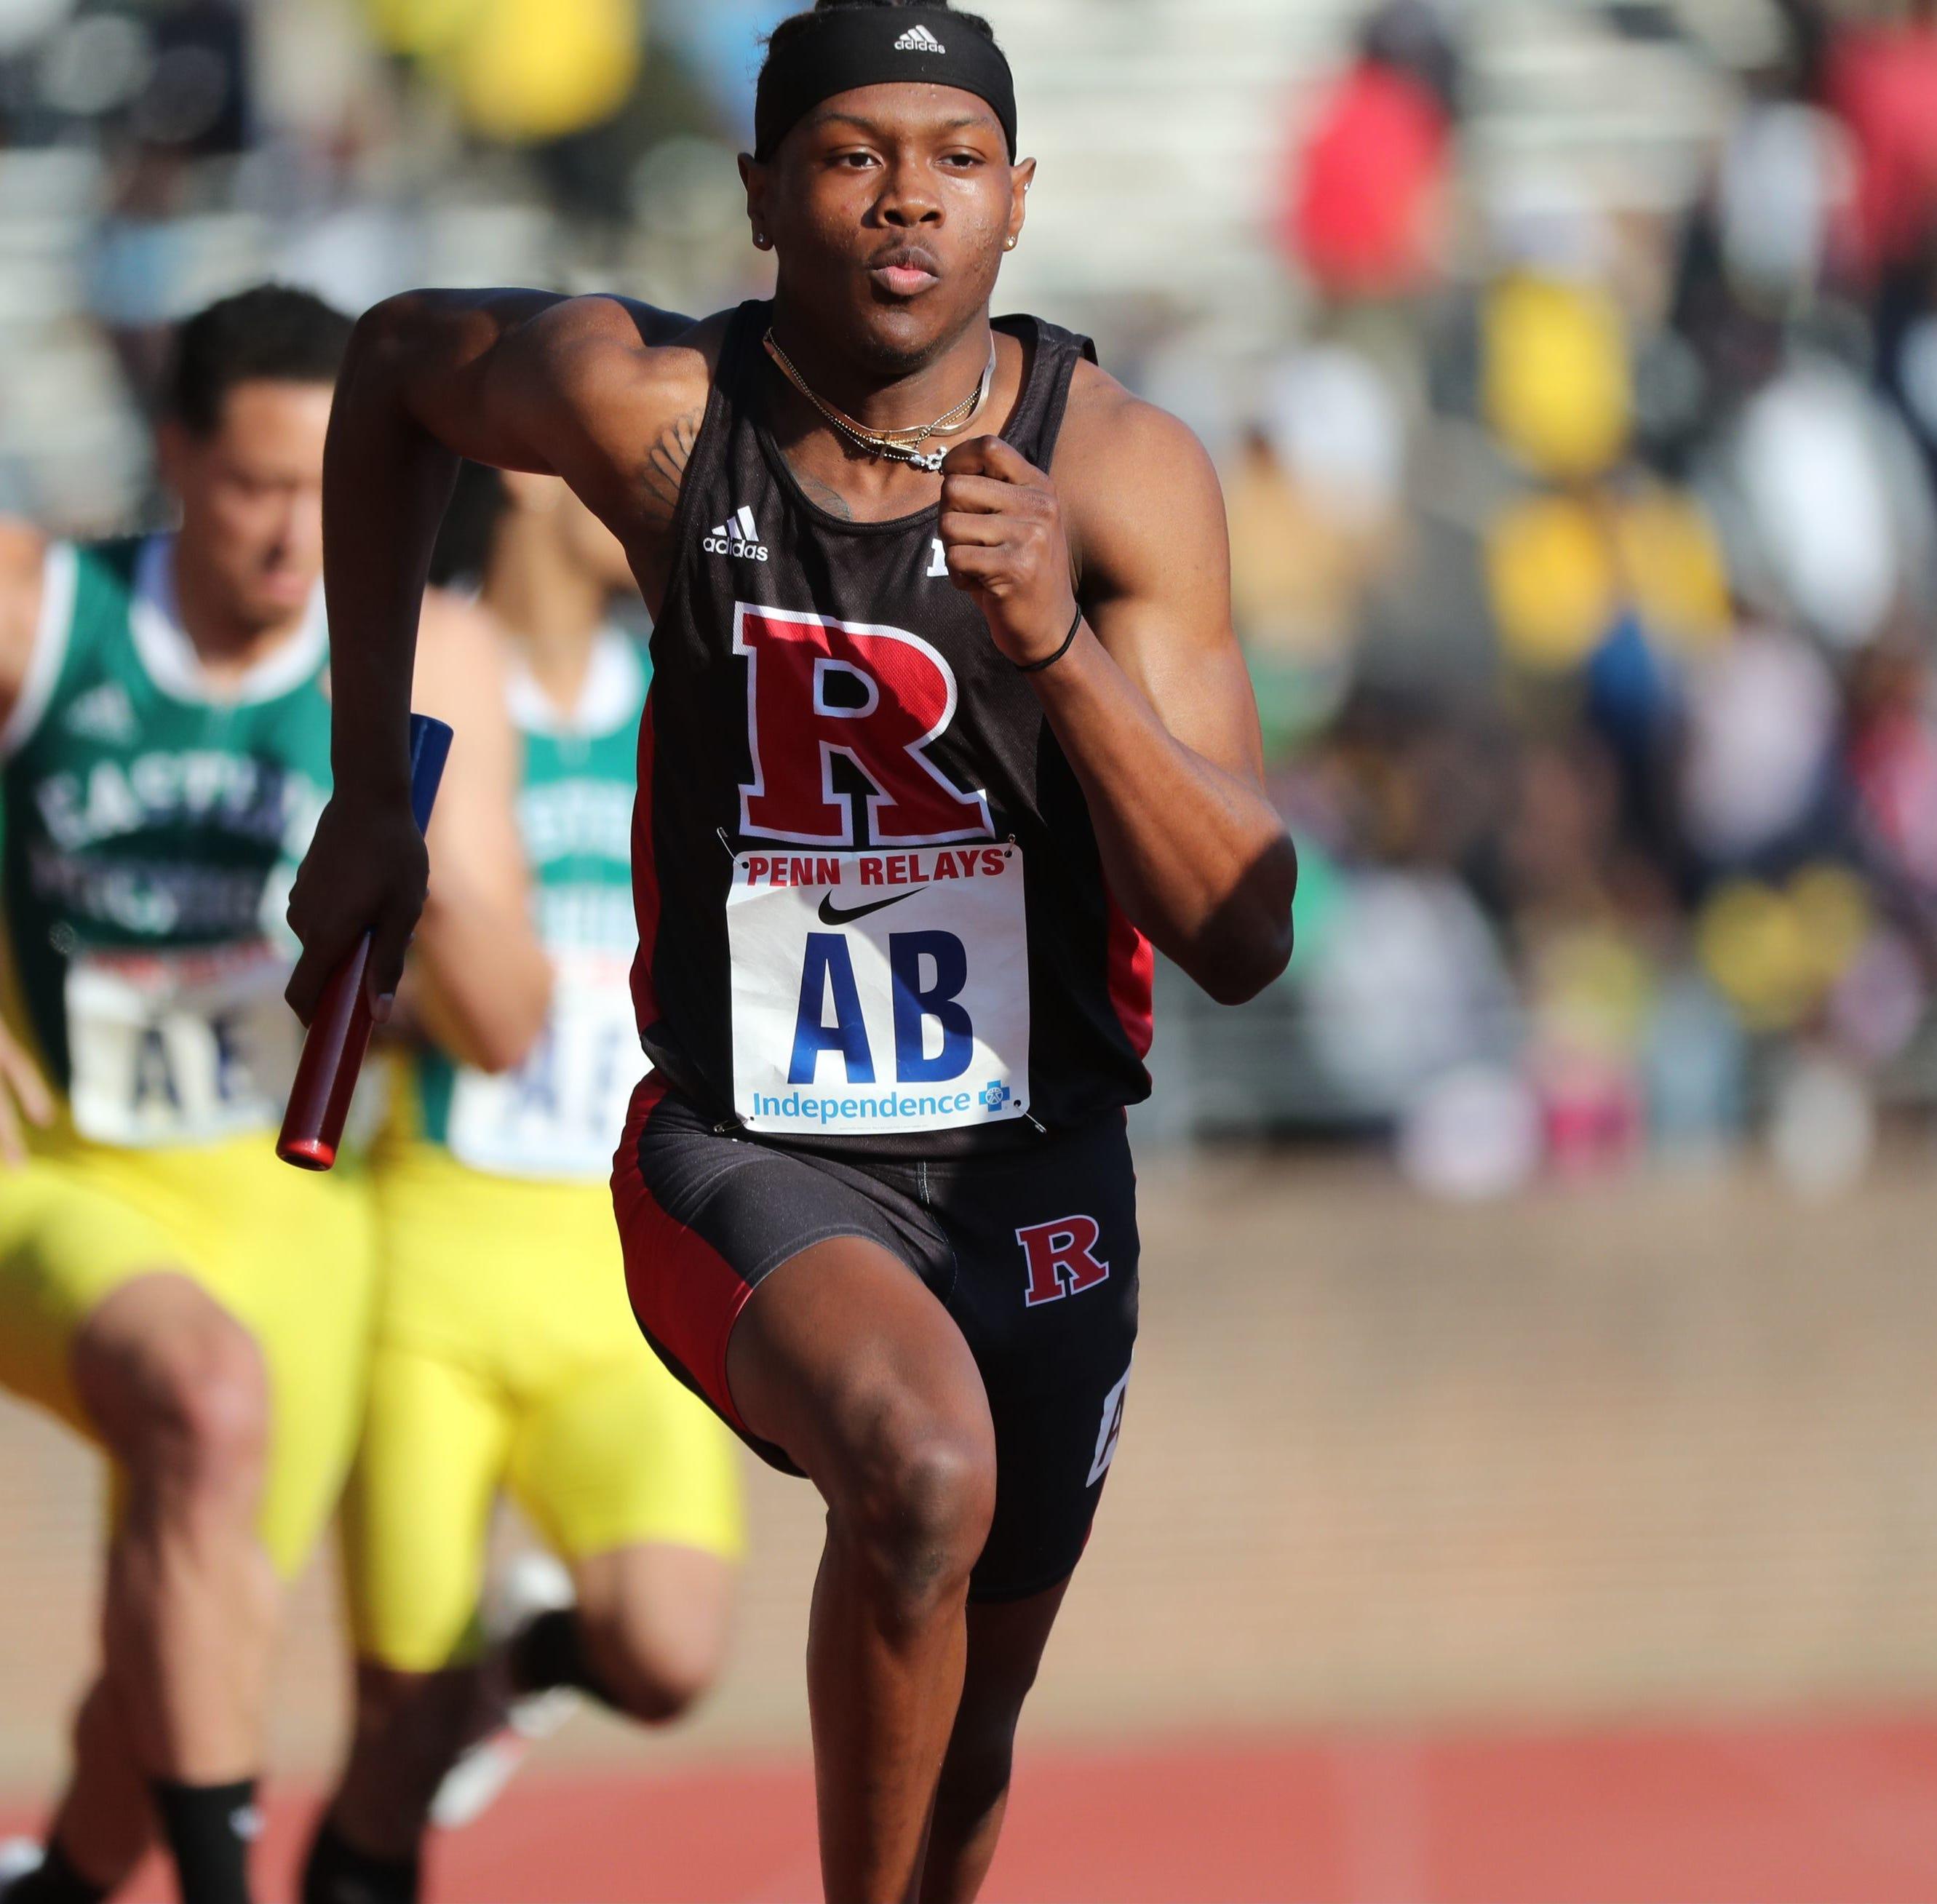 Penn Relays: Taj Burgess ready to lead record-setting Rutgers 4x400's quest for a wheel